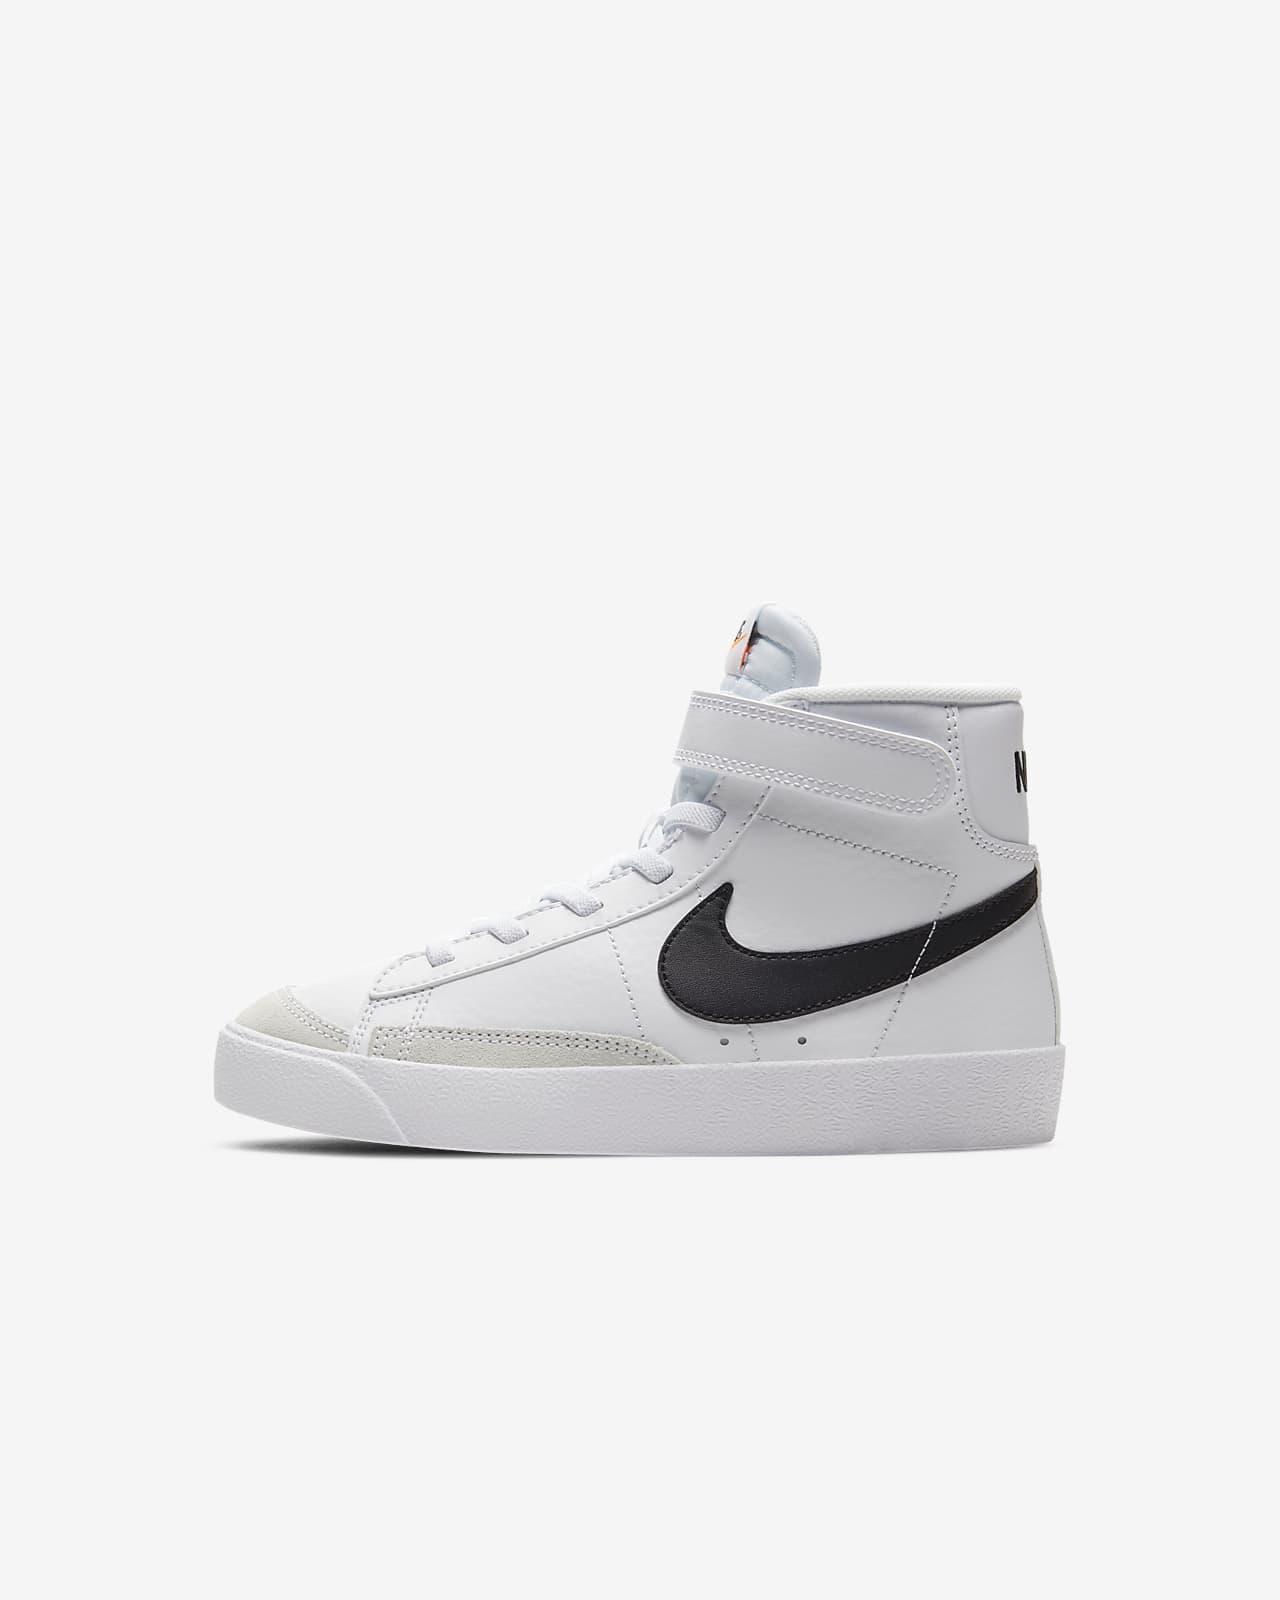 Calzado para niños talla pequeña Nike Blazer Mid '77